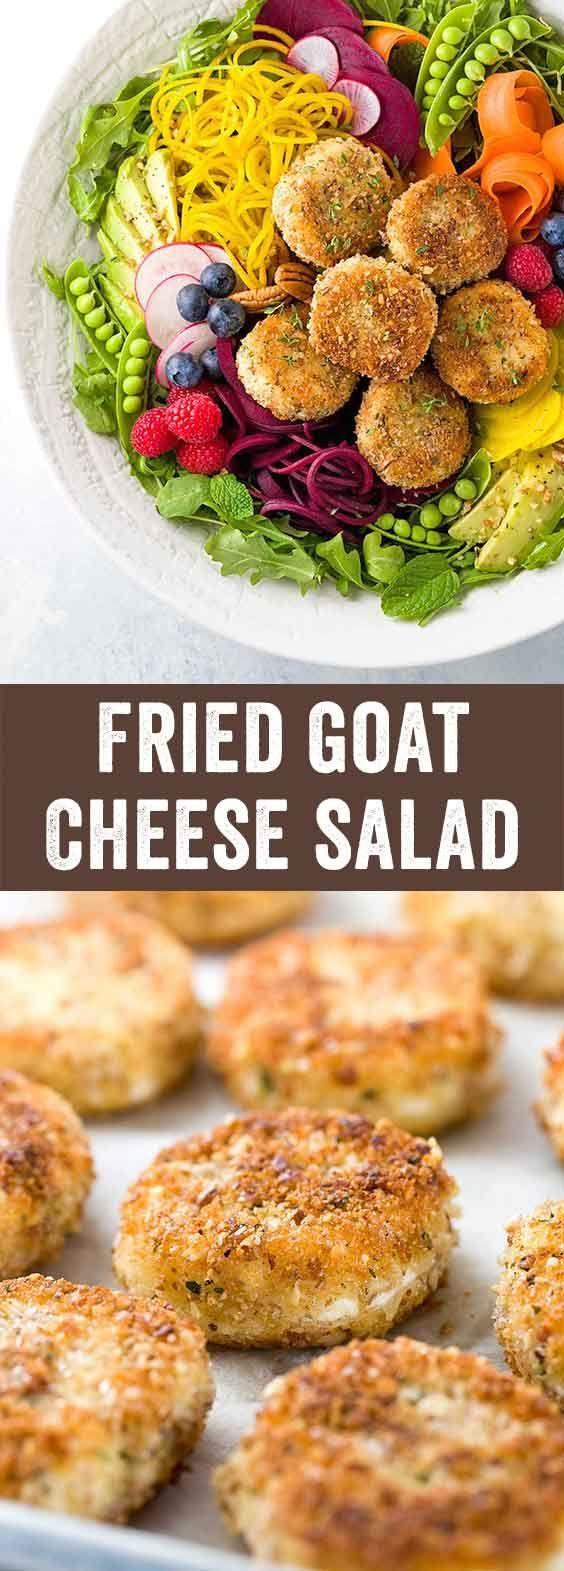 Fried Goat Cheese Salad - Fresh spring vegetable salad recipe with arugula, beets, carrots, peas, avocado and raspberry poppyseed dressing. via @foodiegavin